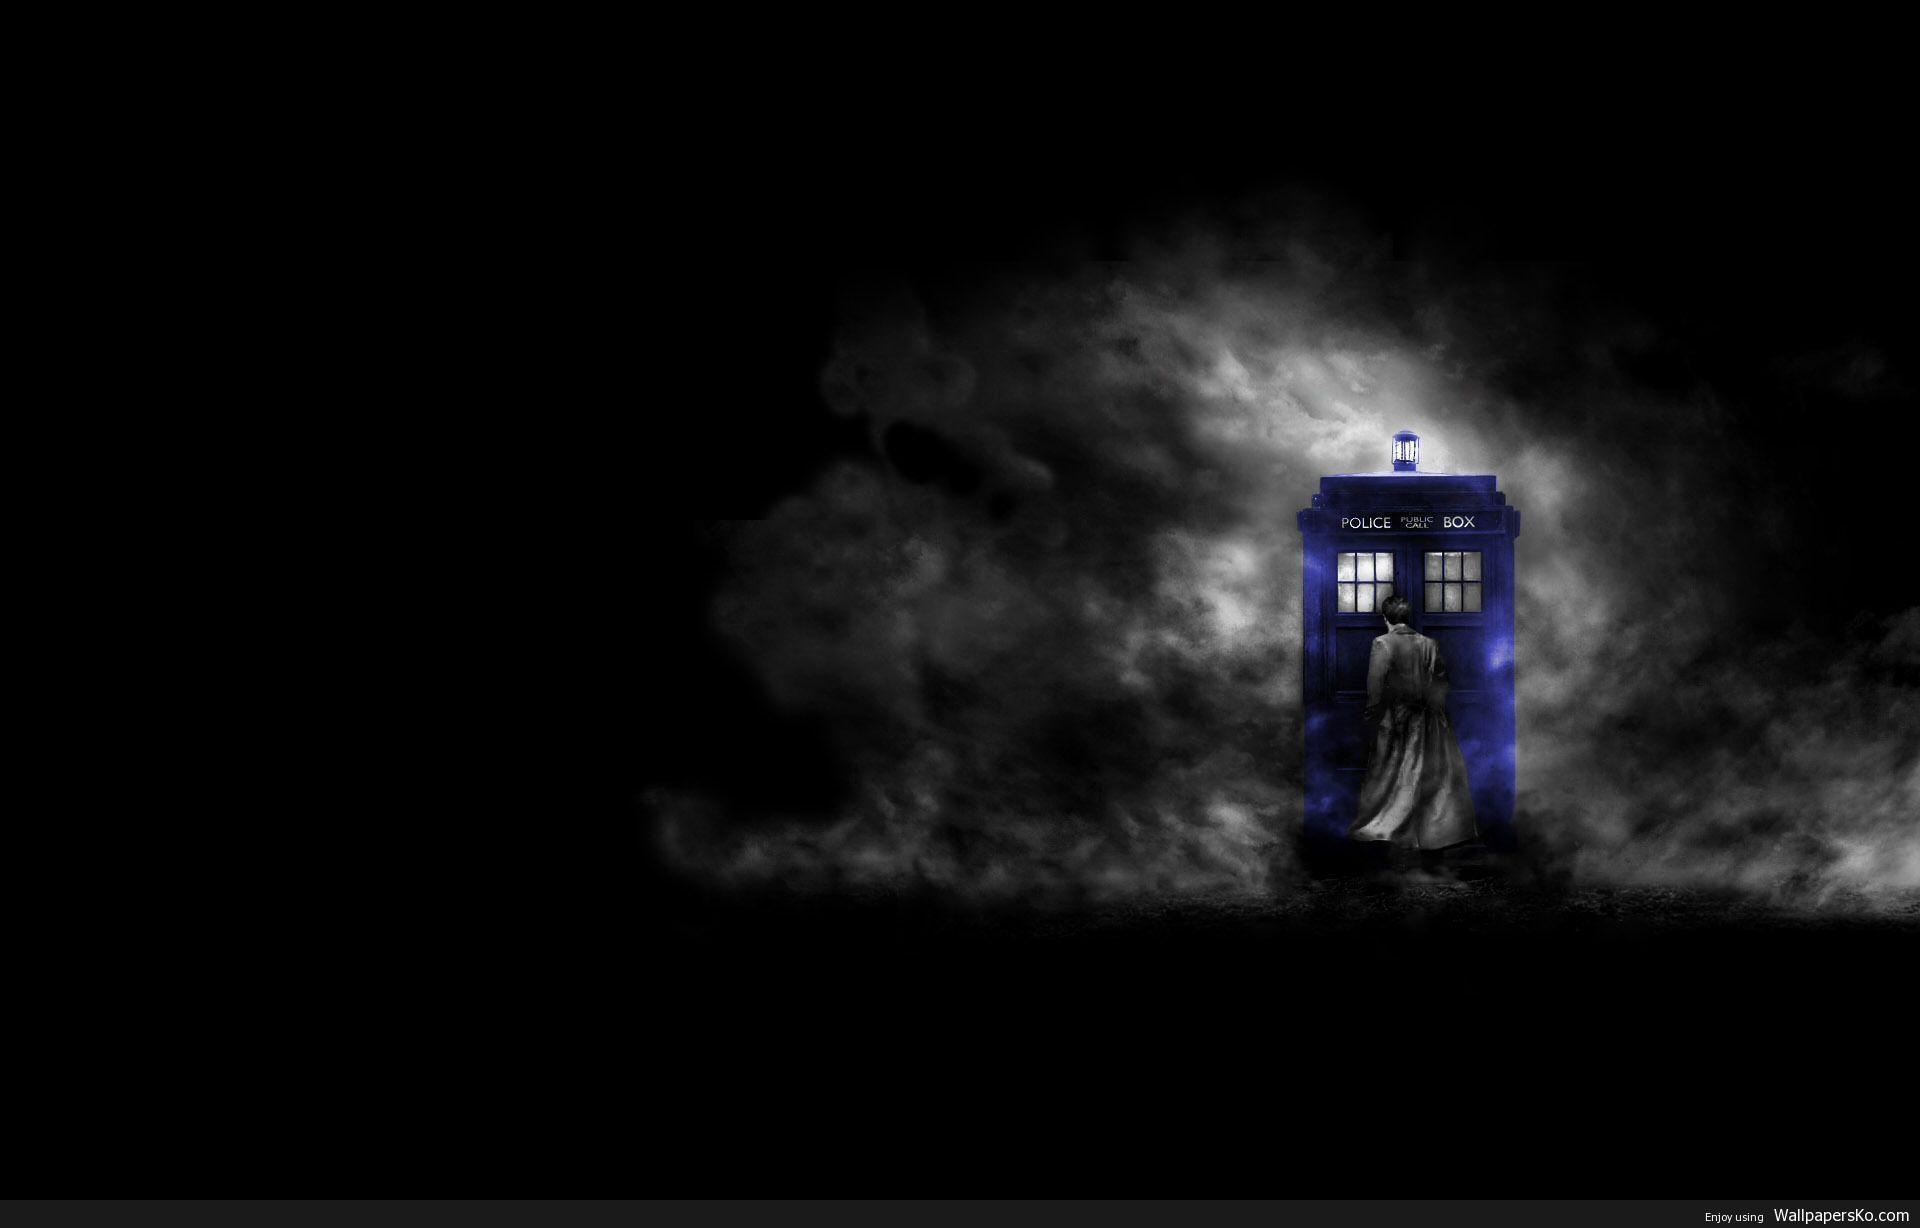 Dr Who Hd Wallpaper